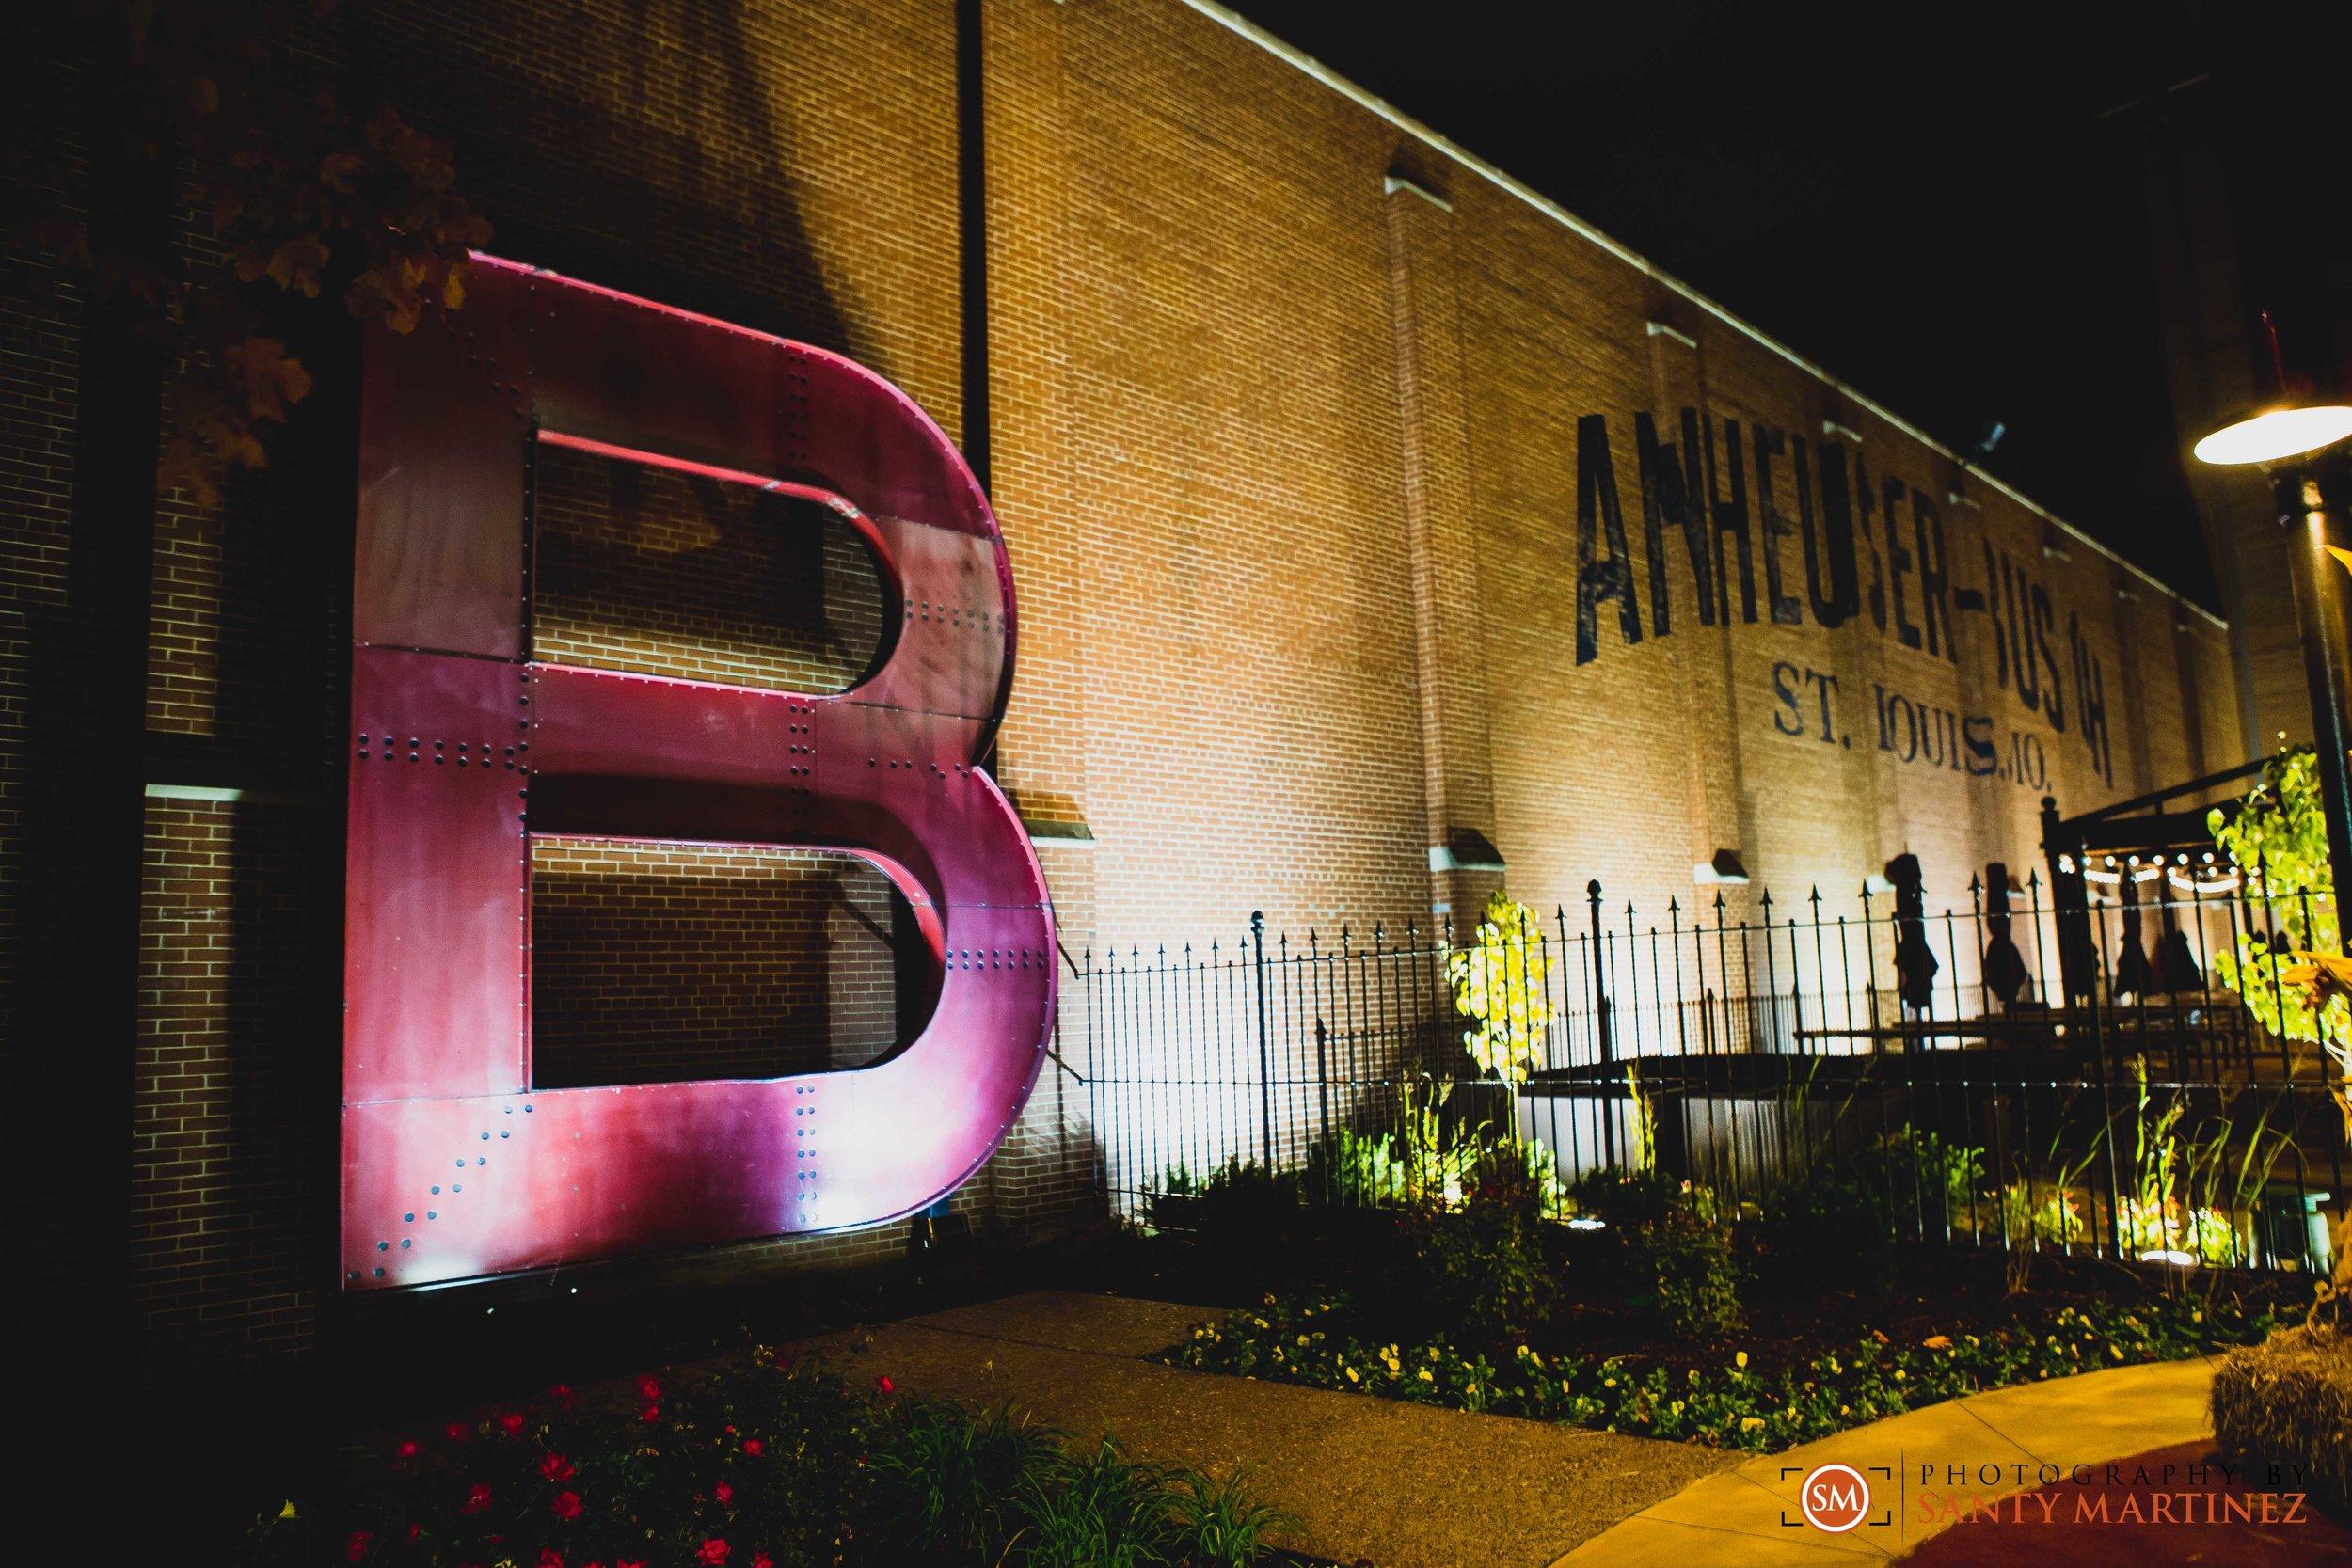 Travel St Louis Missouri - Photography Santy Martinez-36.jpg